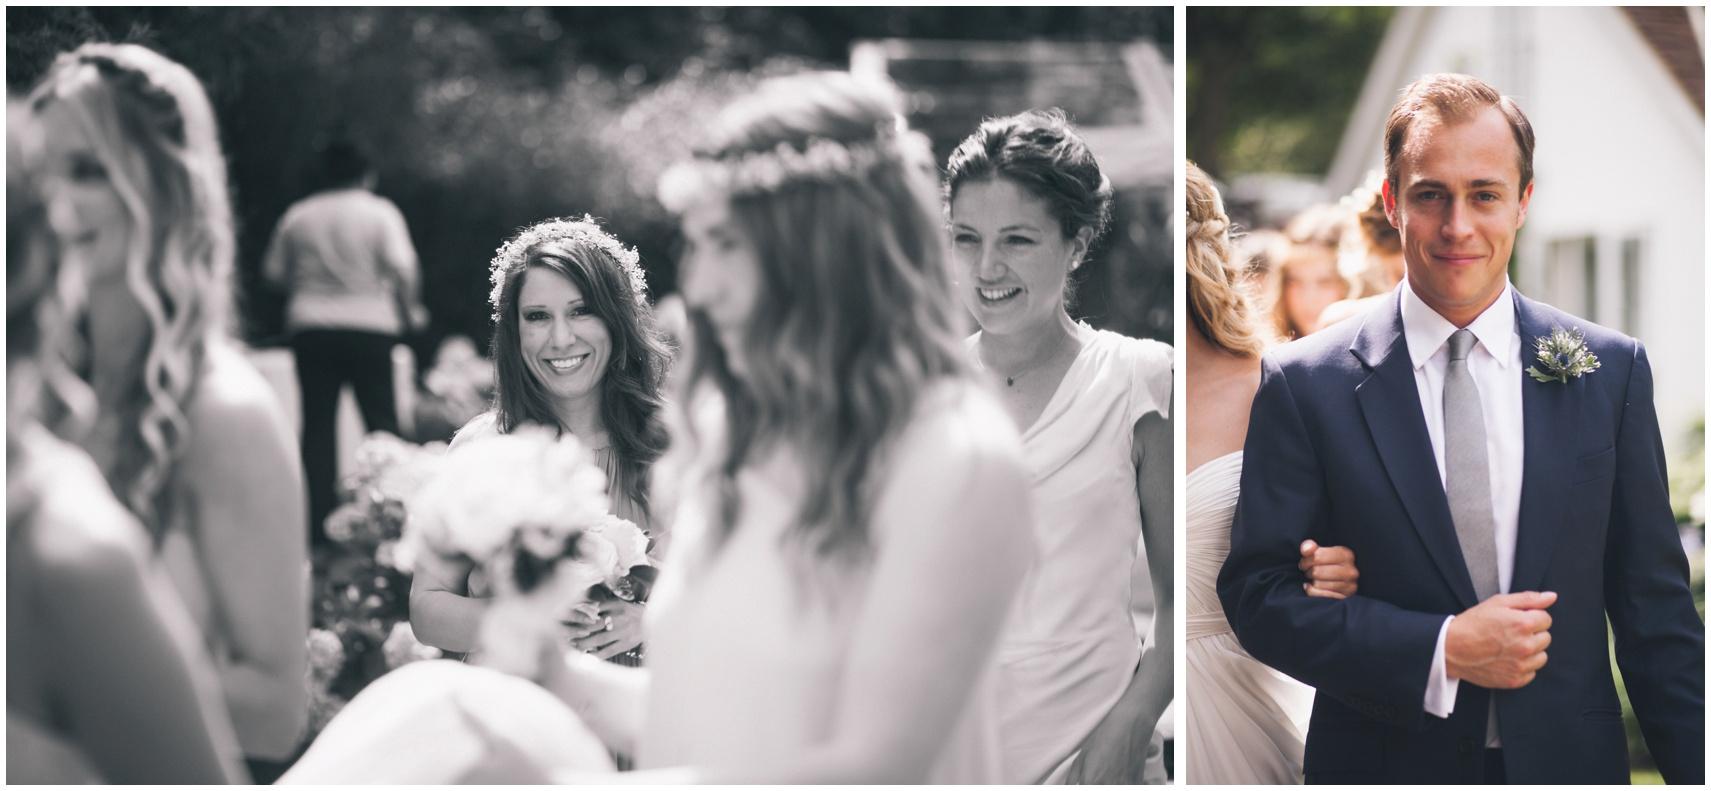 BMC Wedding photography Rutland_0386.jpg